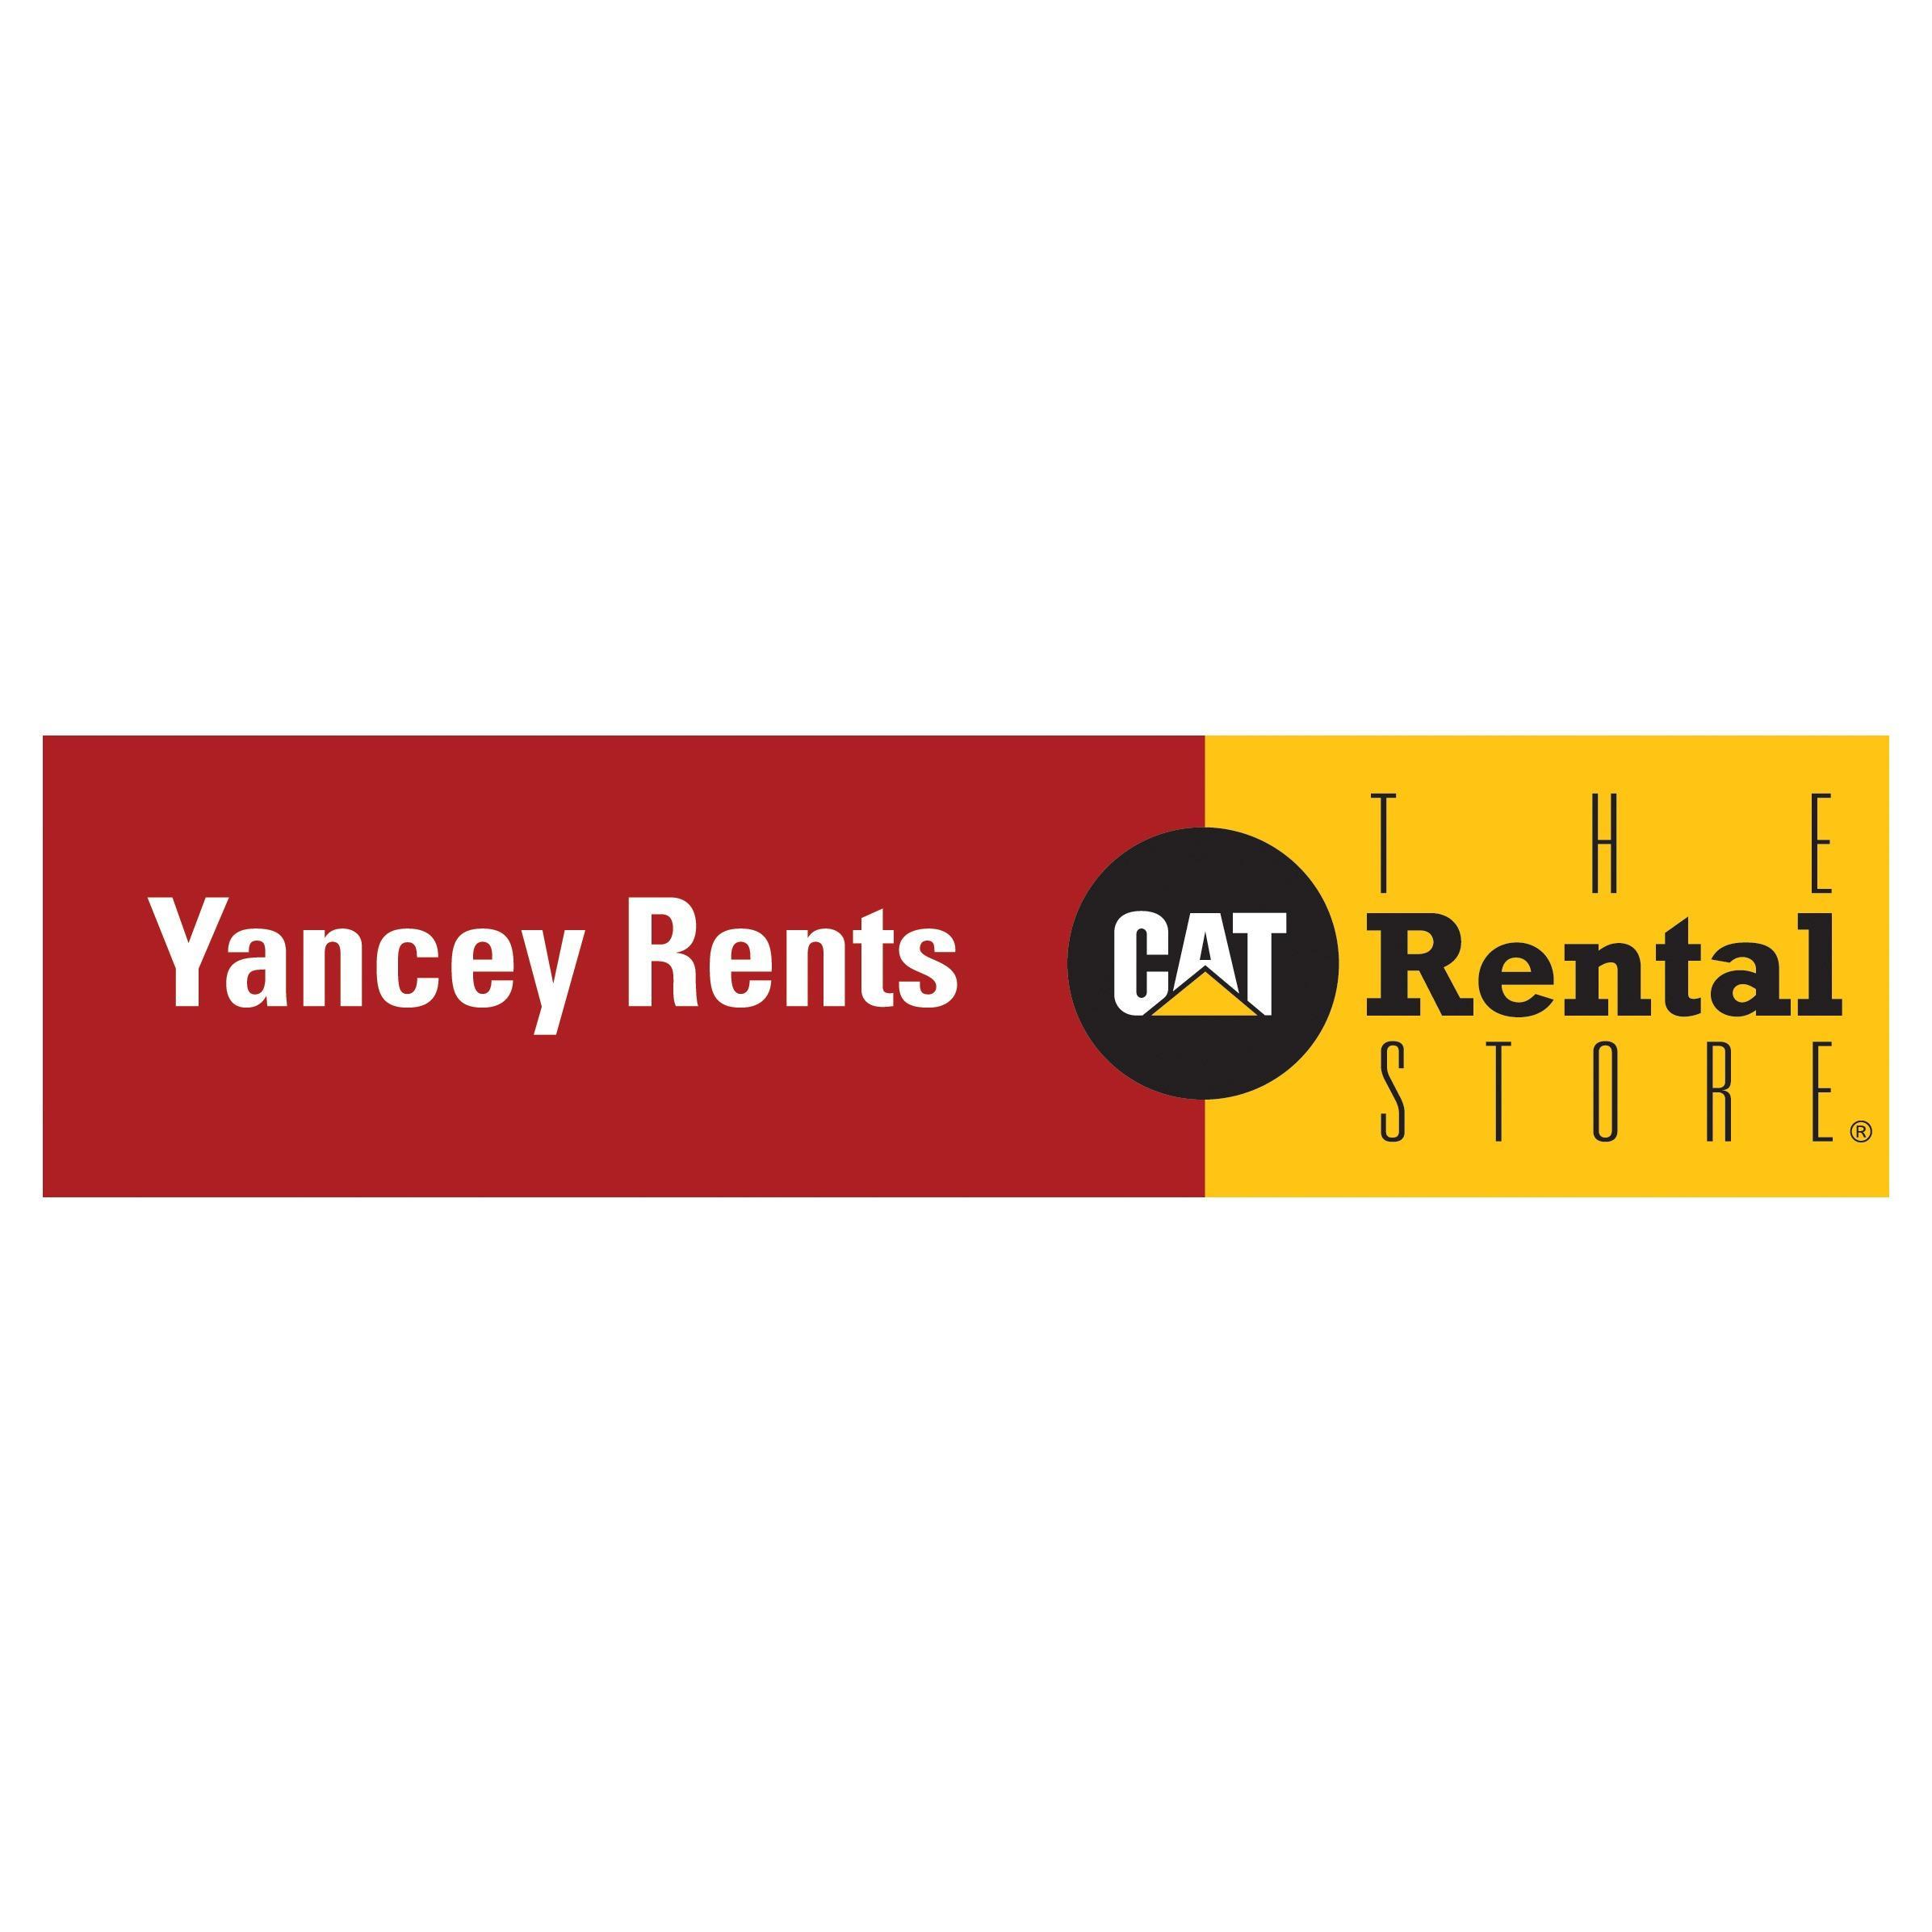 Yancey Rents Cat Rental Store